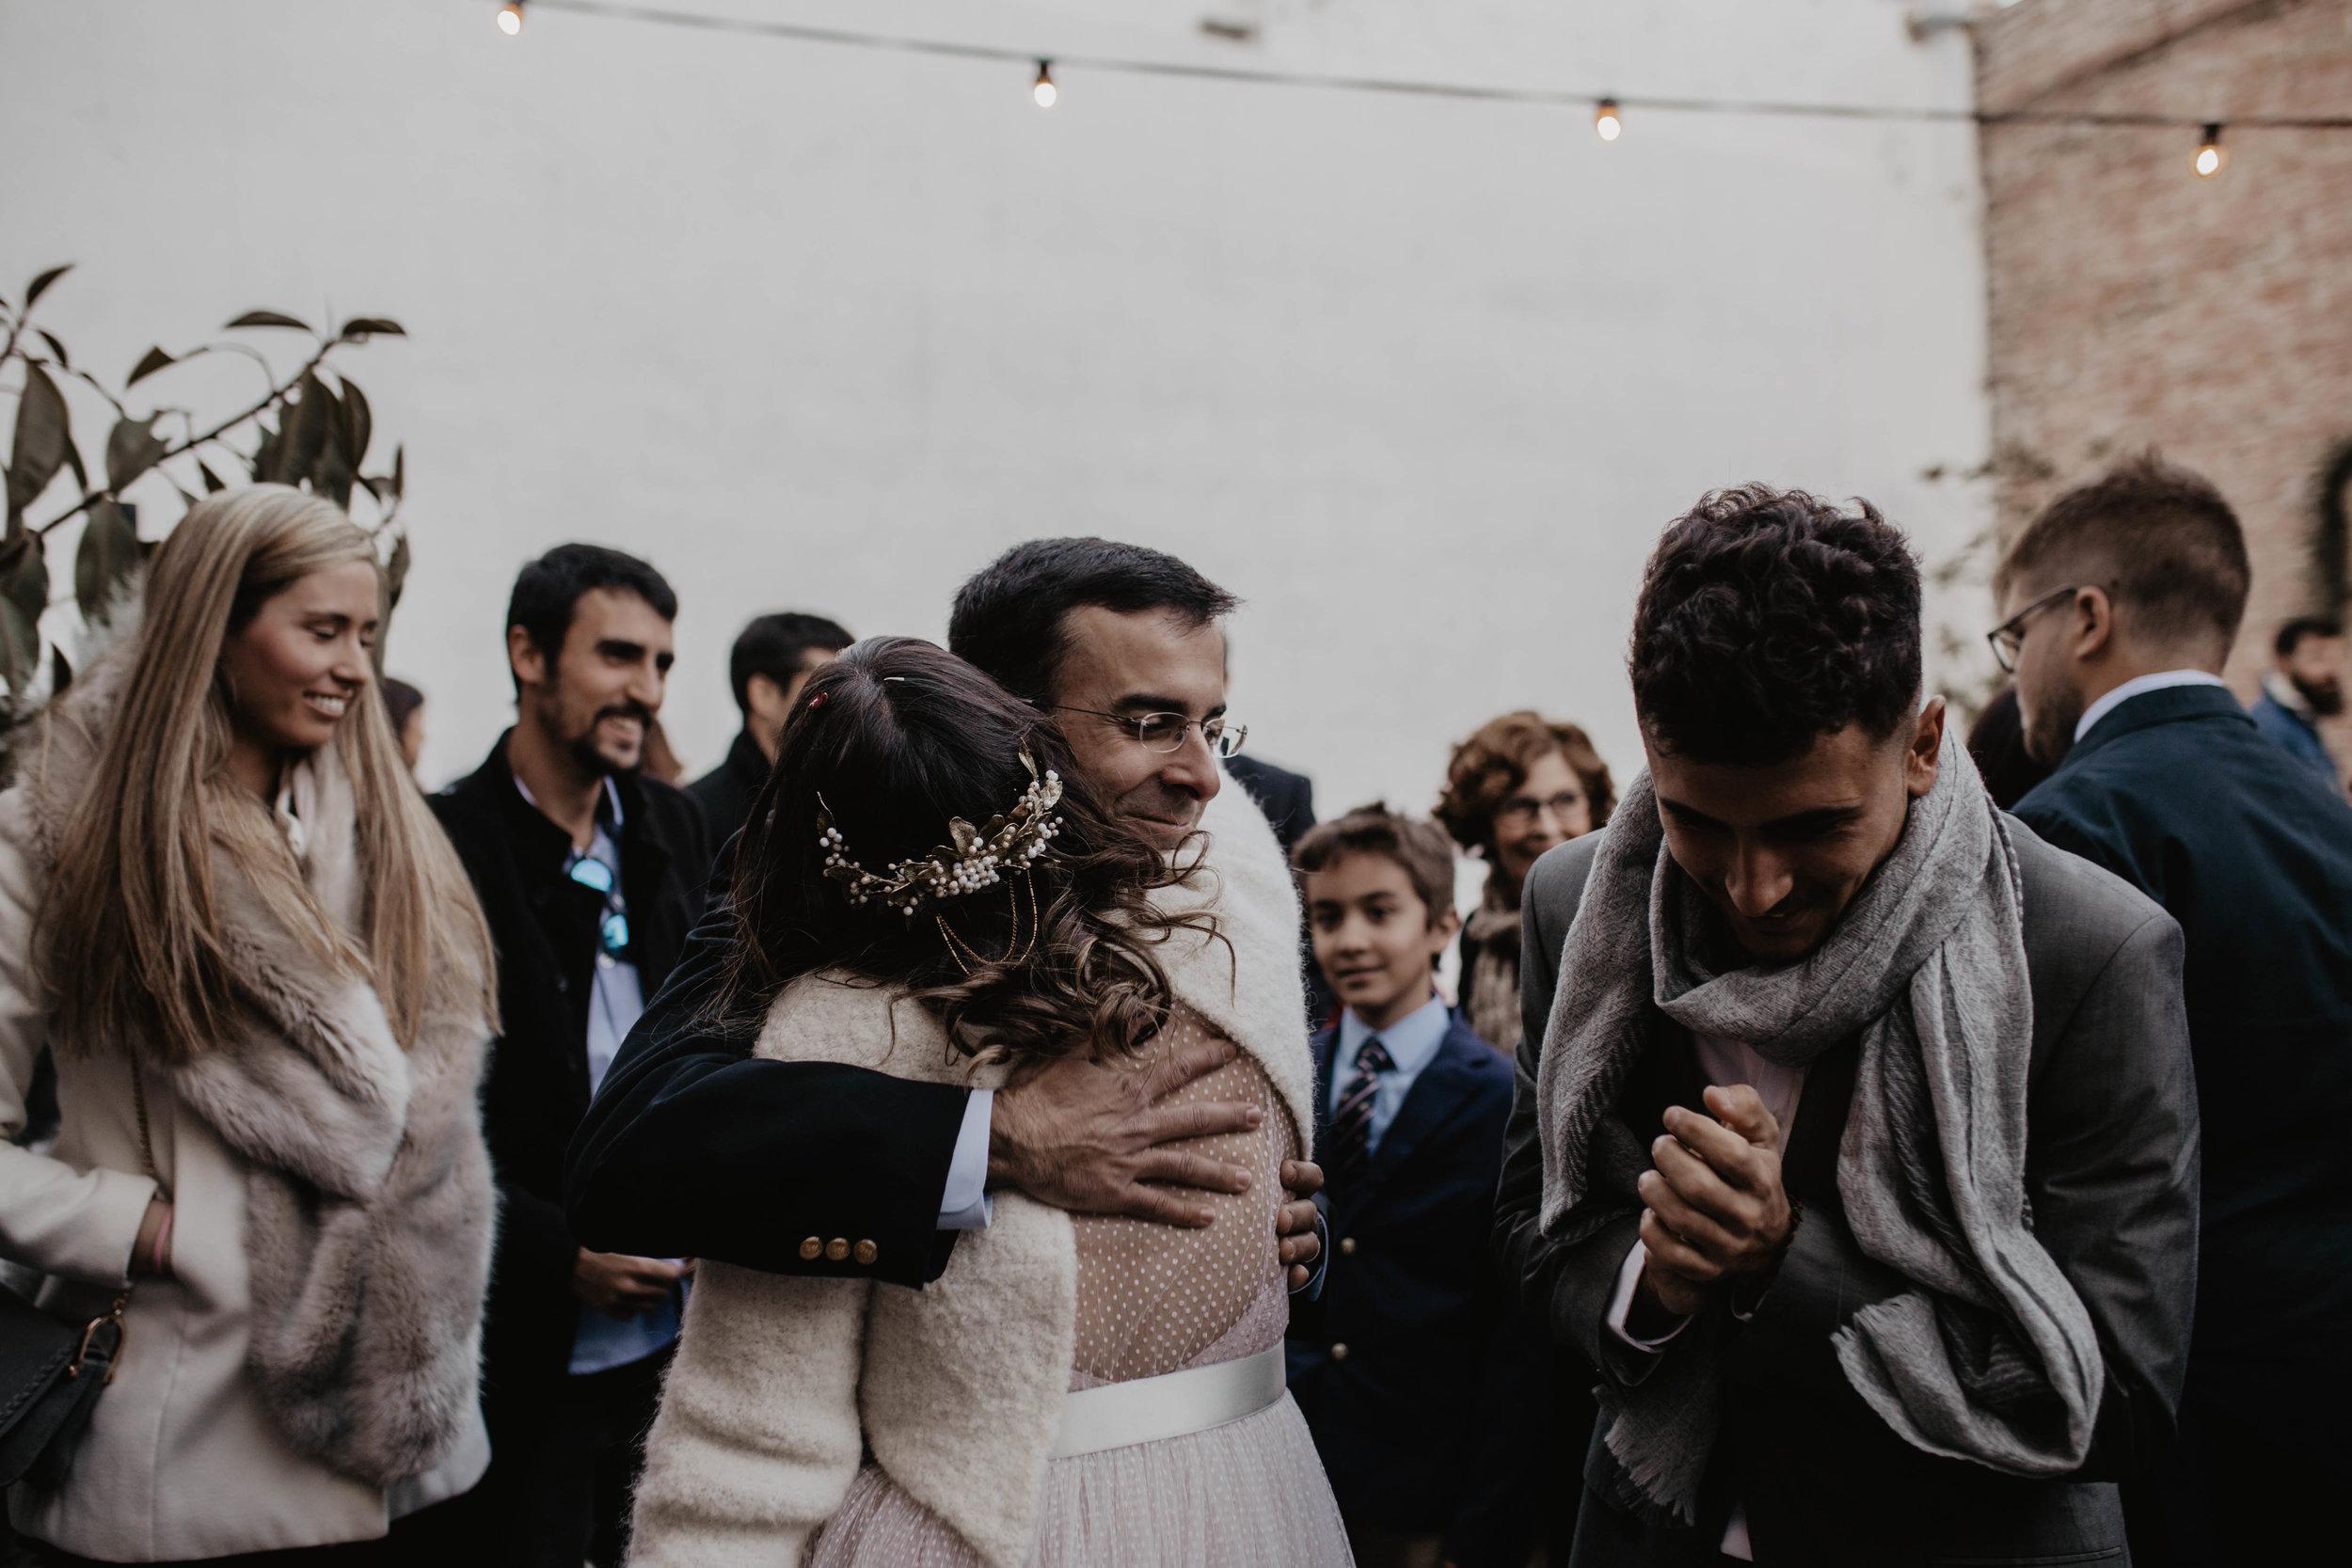 thenortherngirlphotography-photography-weddingphotography-couple-bodasconestilo-bodasenbarcelona-martadavid-674.jpg